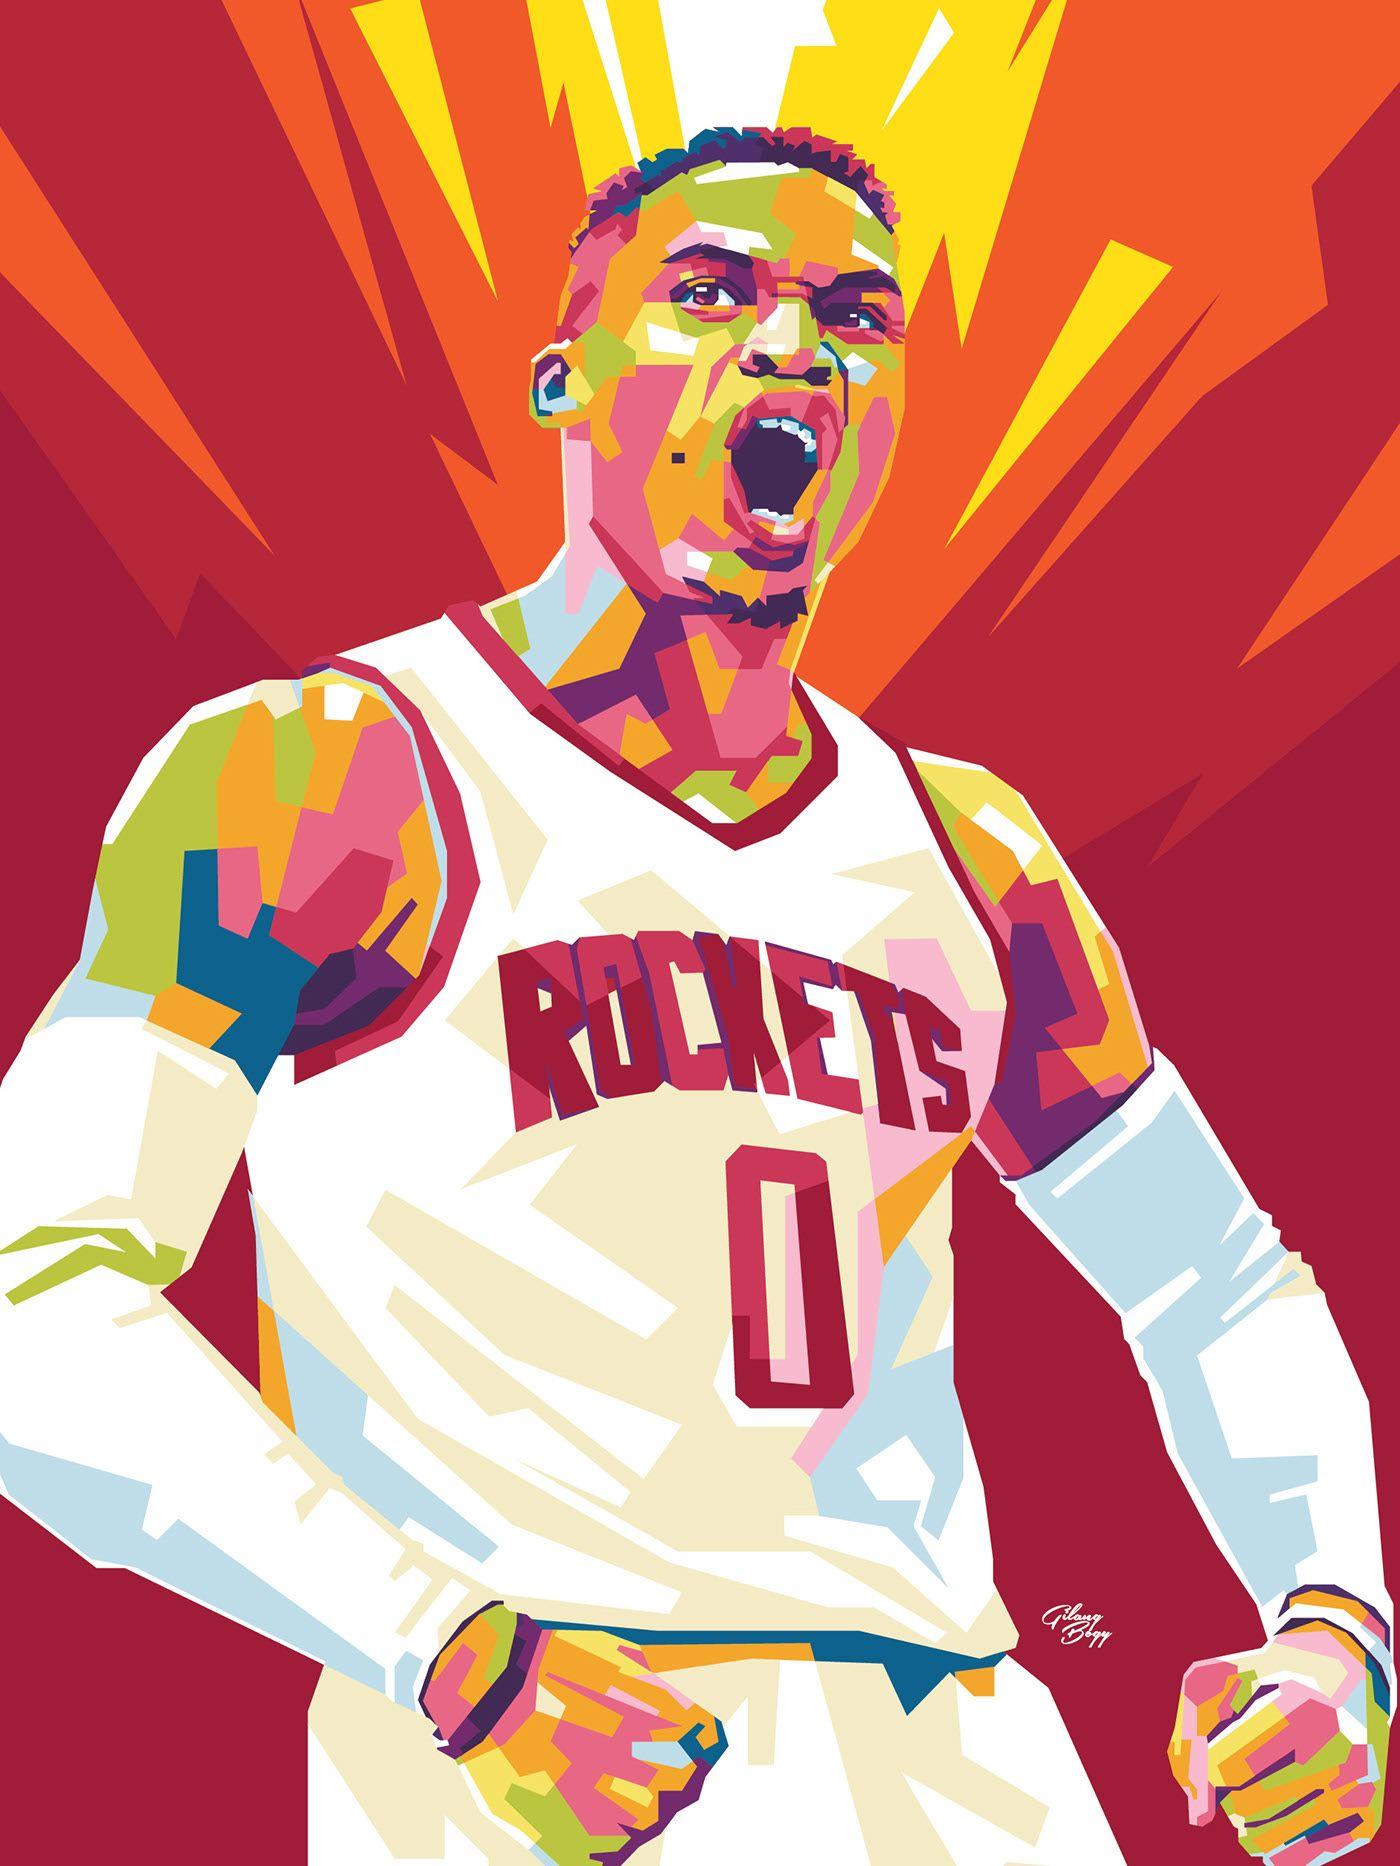 Pin on ALL NBA PLAYERS